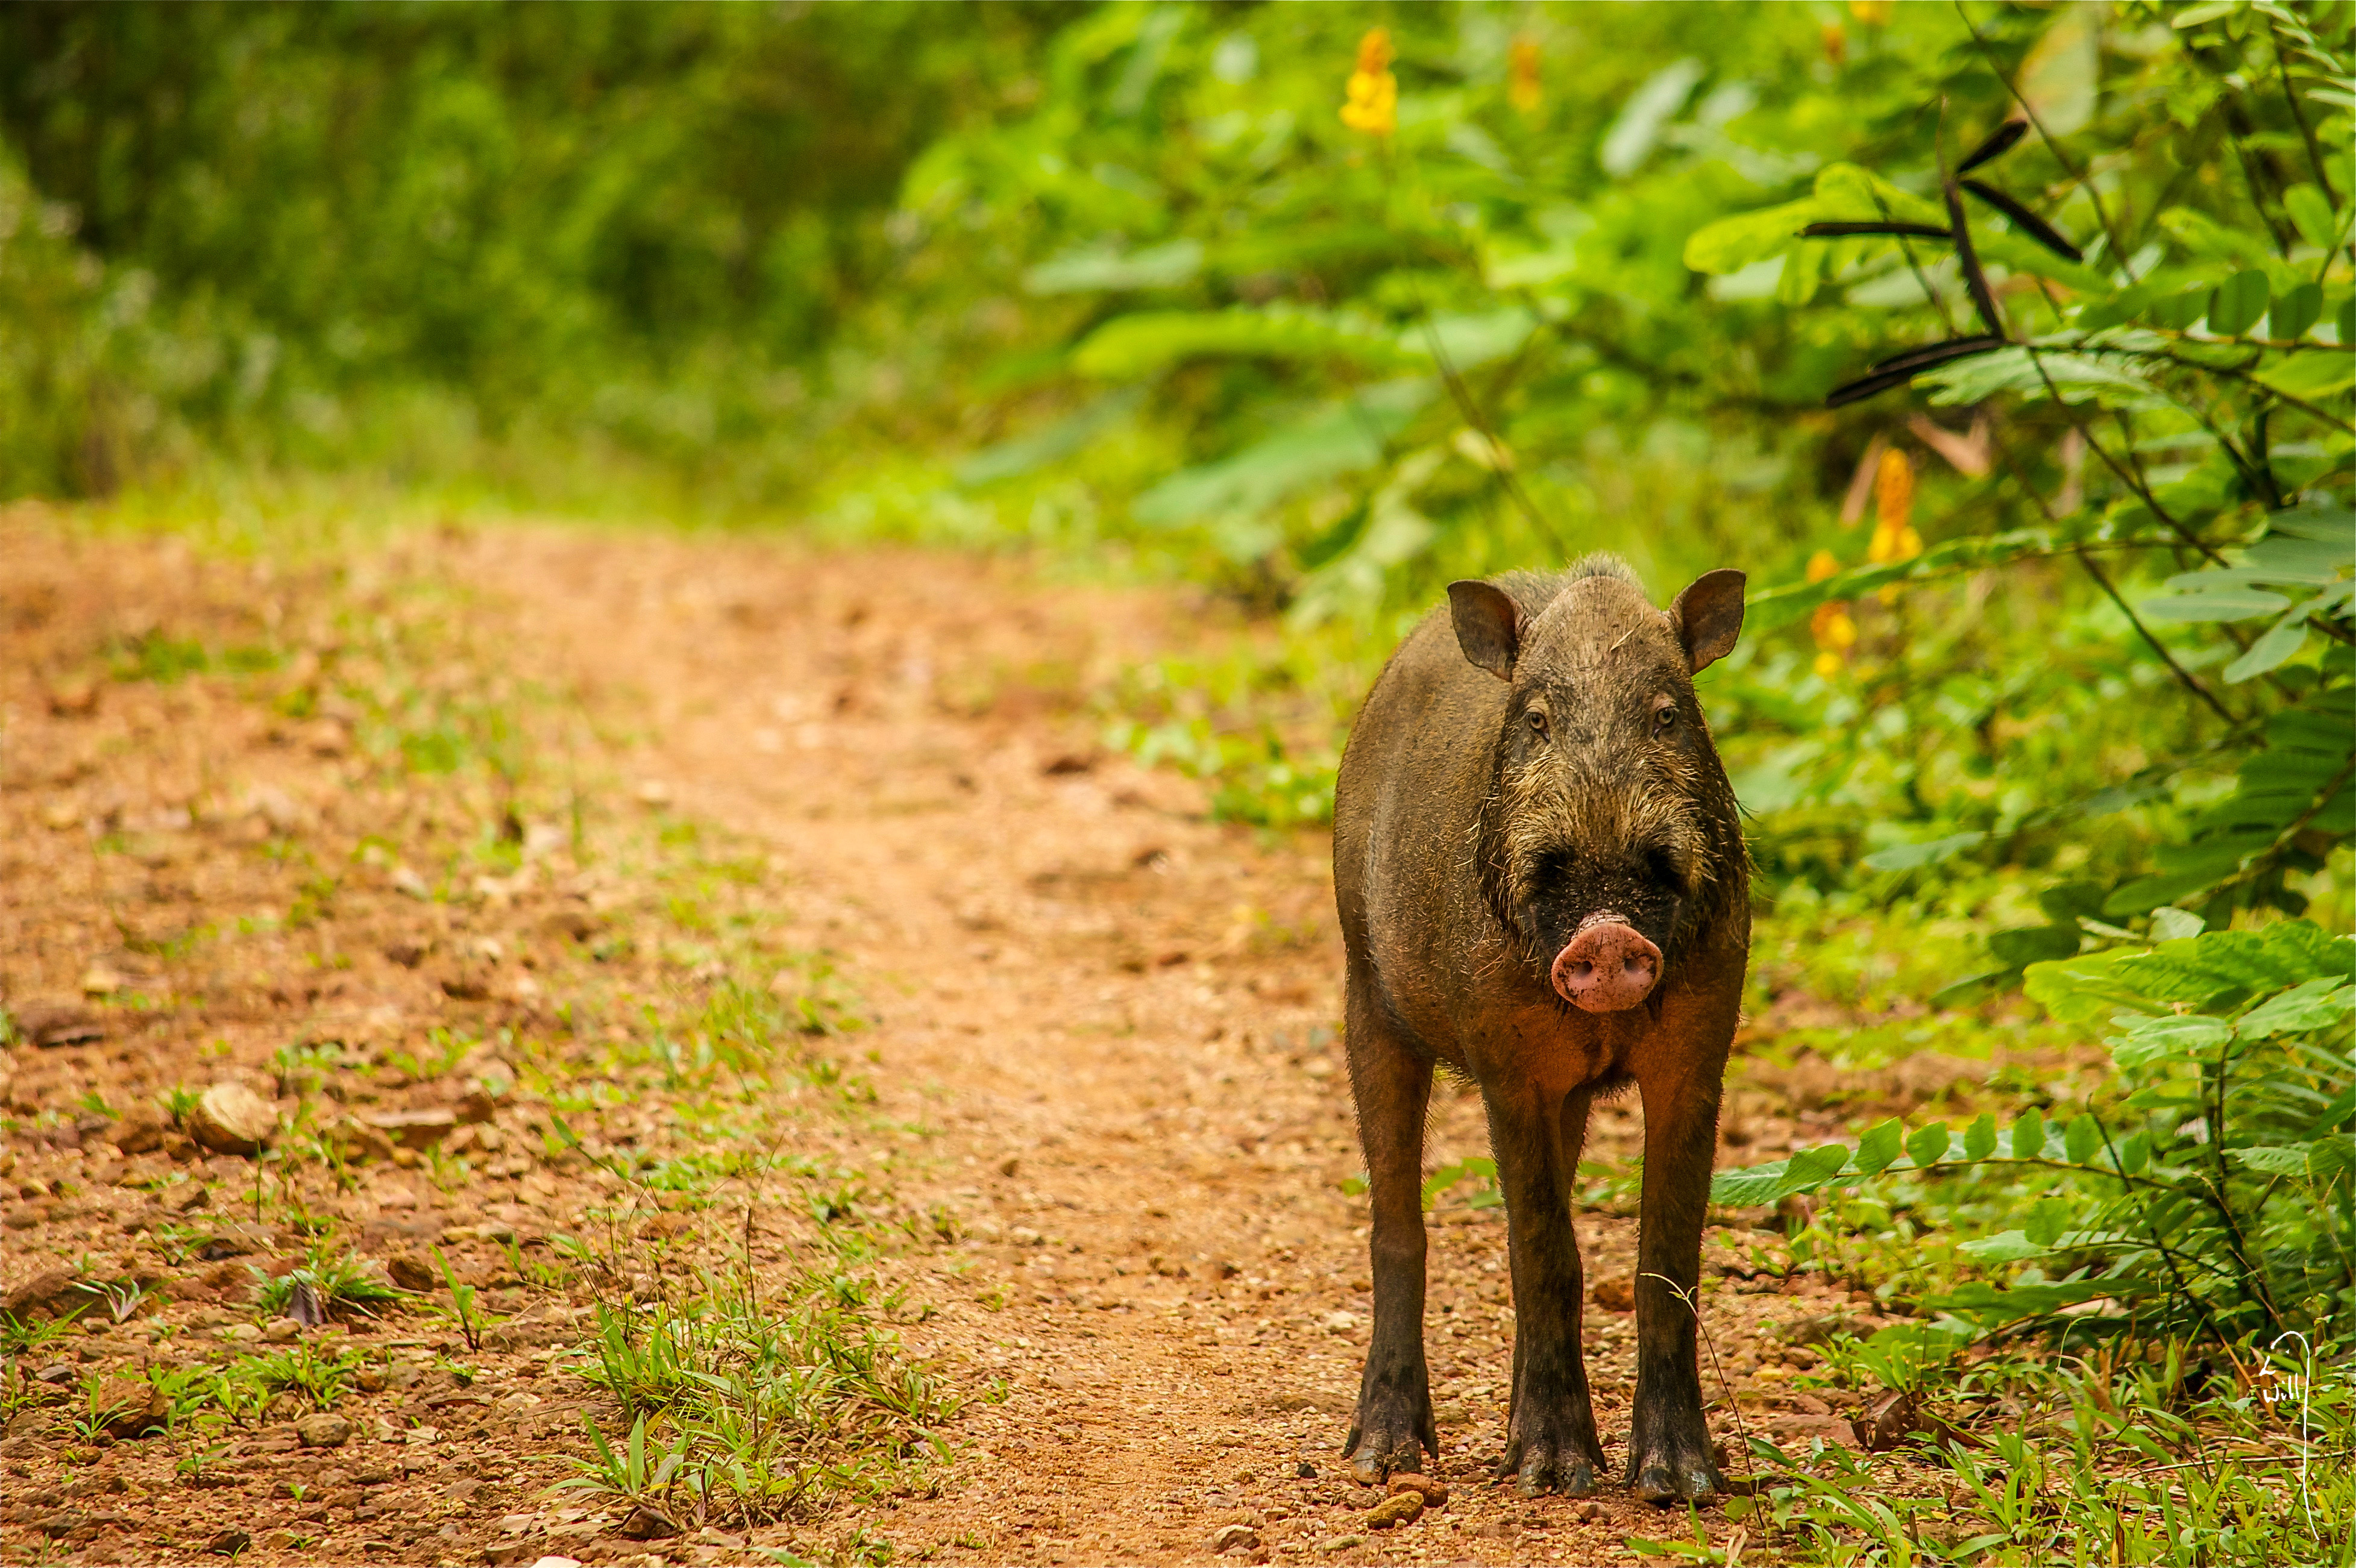 Bearded Pig, Borneo